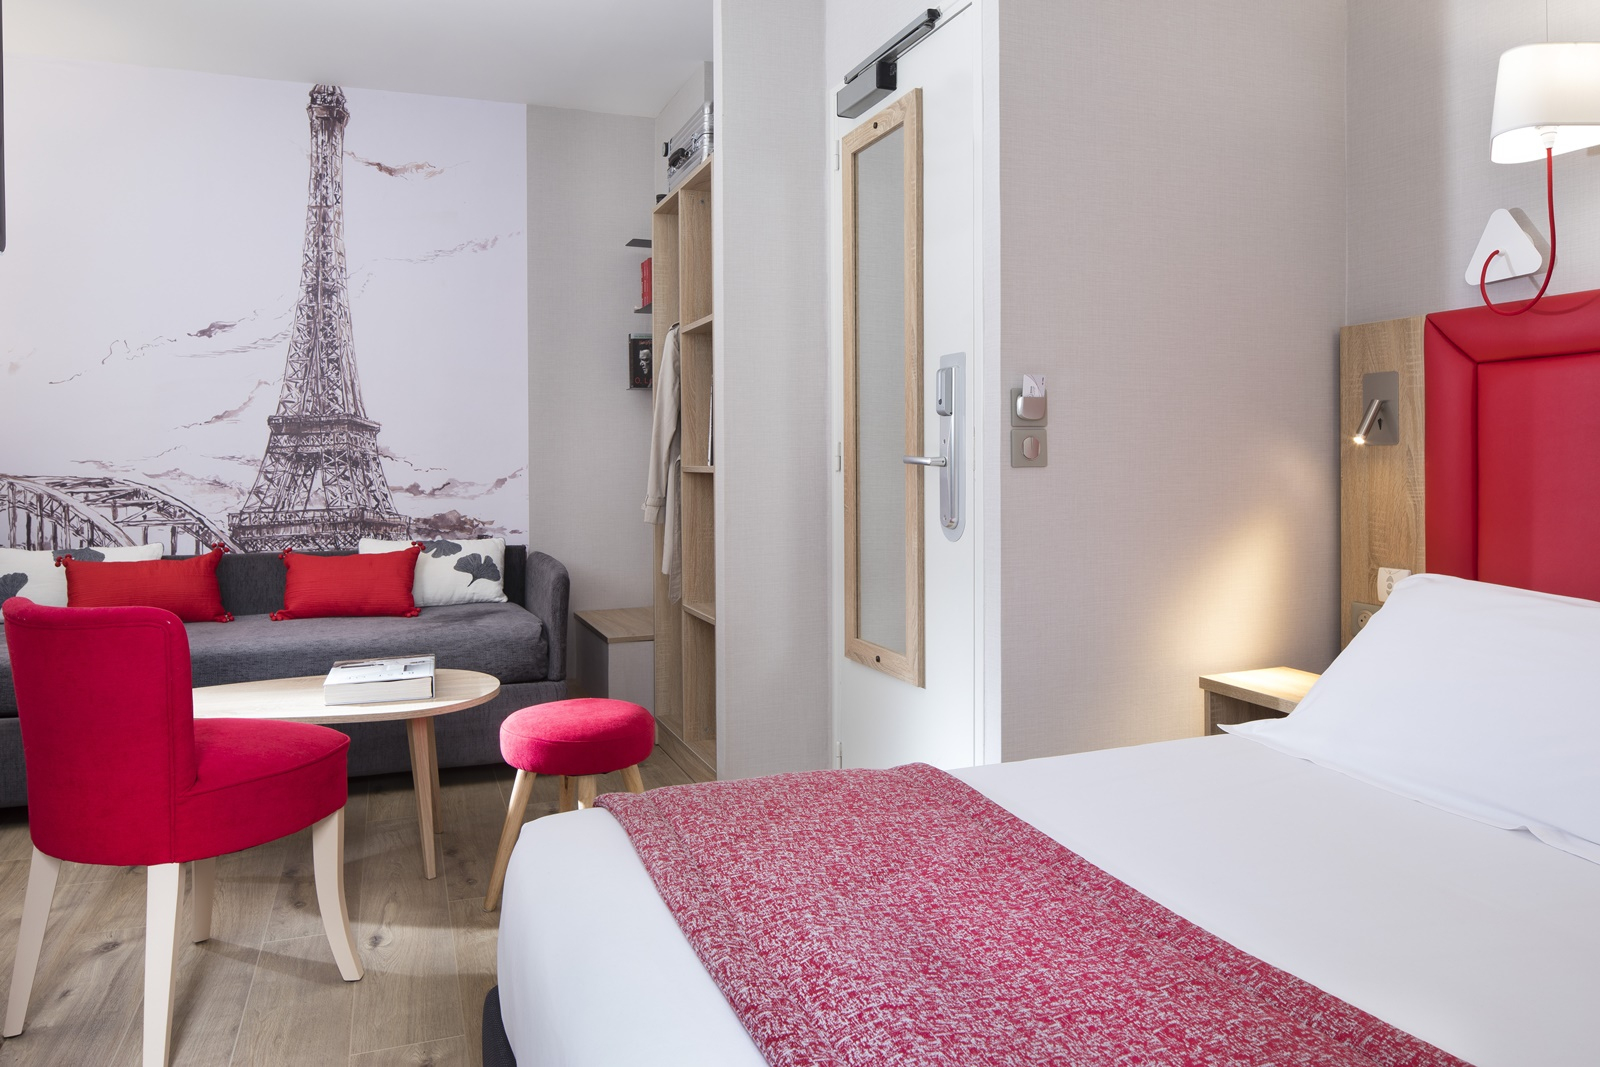 Hôtel Daumesnil Vincennes À Vincennes : Val-De-Marne Tourisme concernant Hotel Des Jardins Vincennes